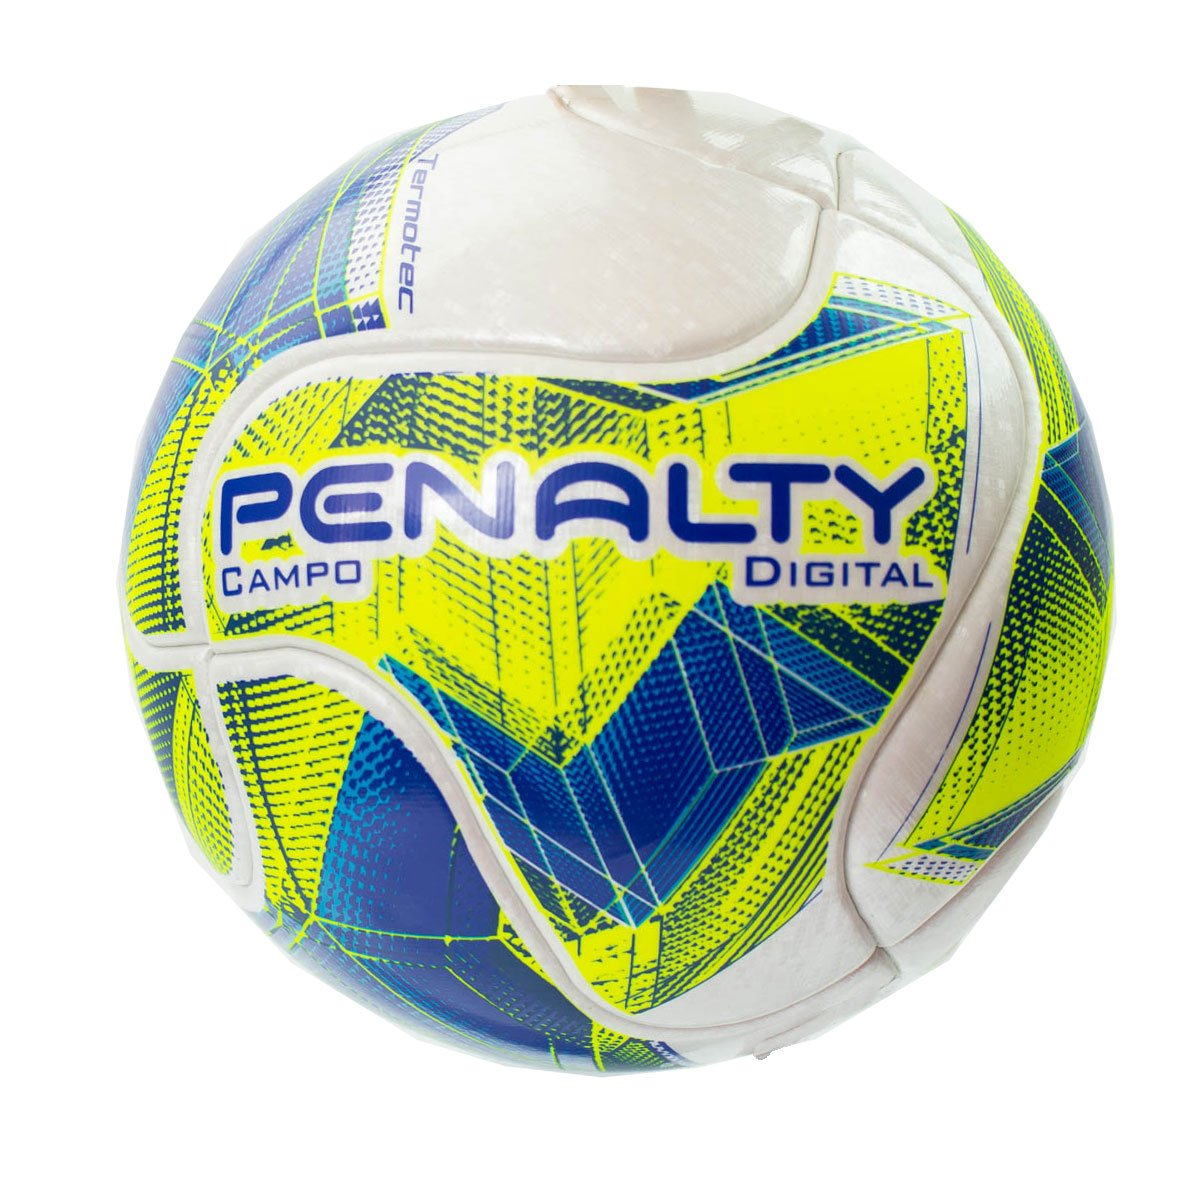 Bizz Store - Bola Futebol De Campo Penalty Digital PU d91be7de78ef1